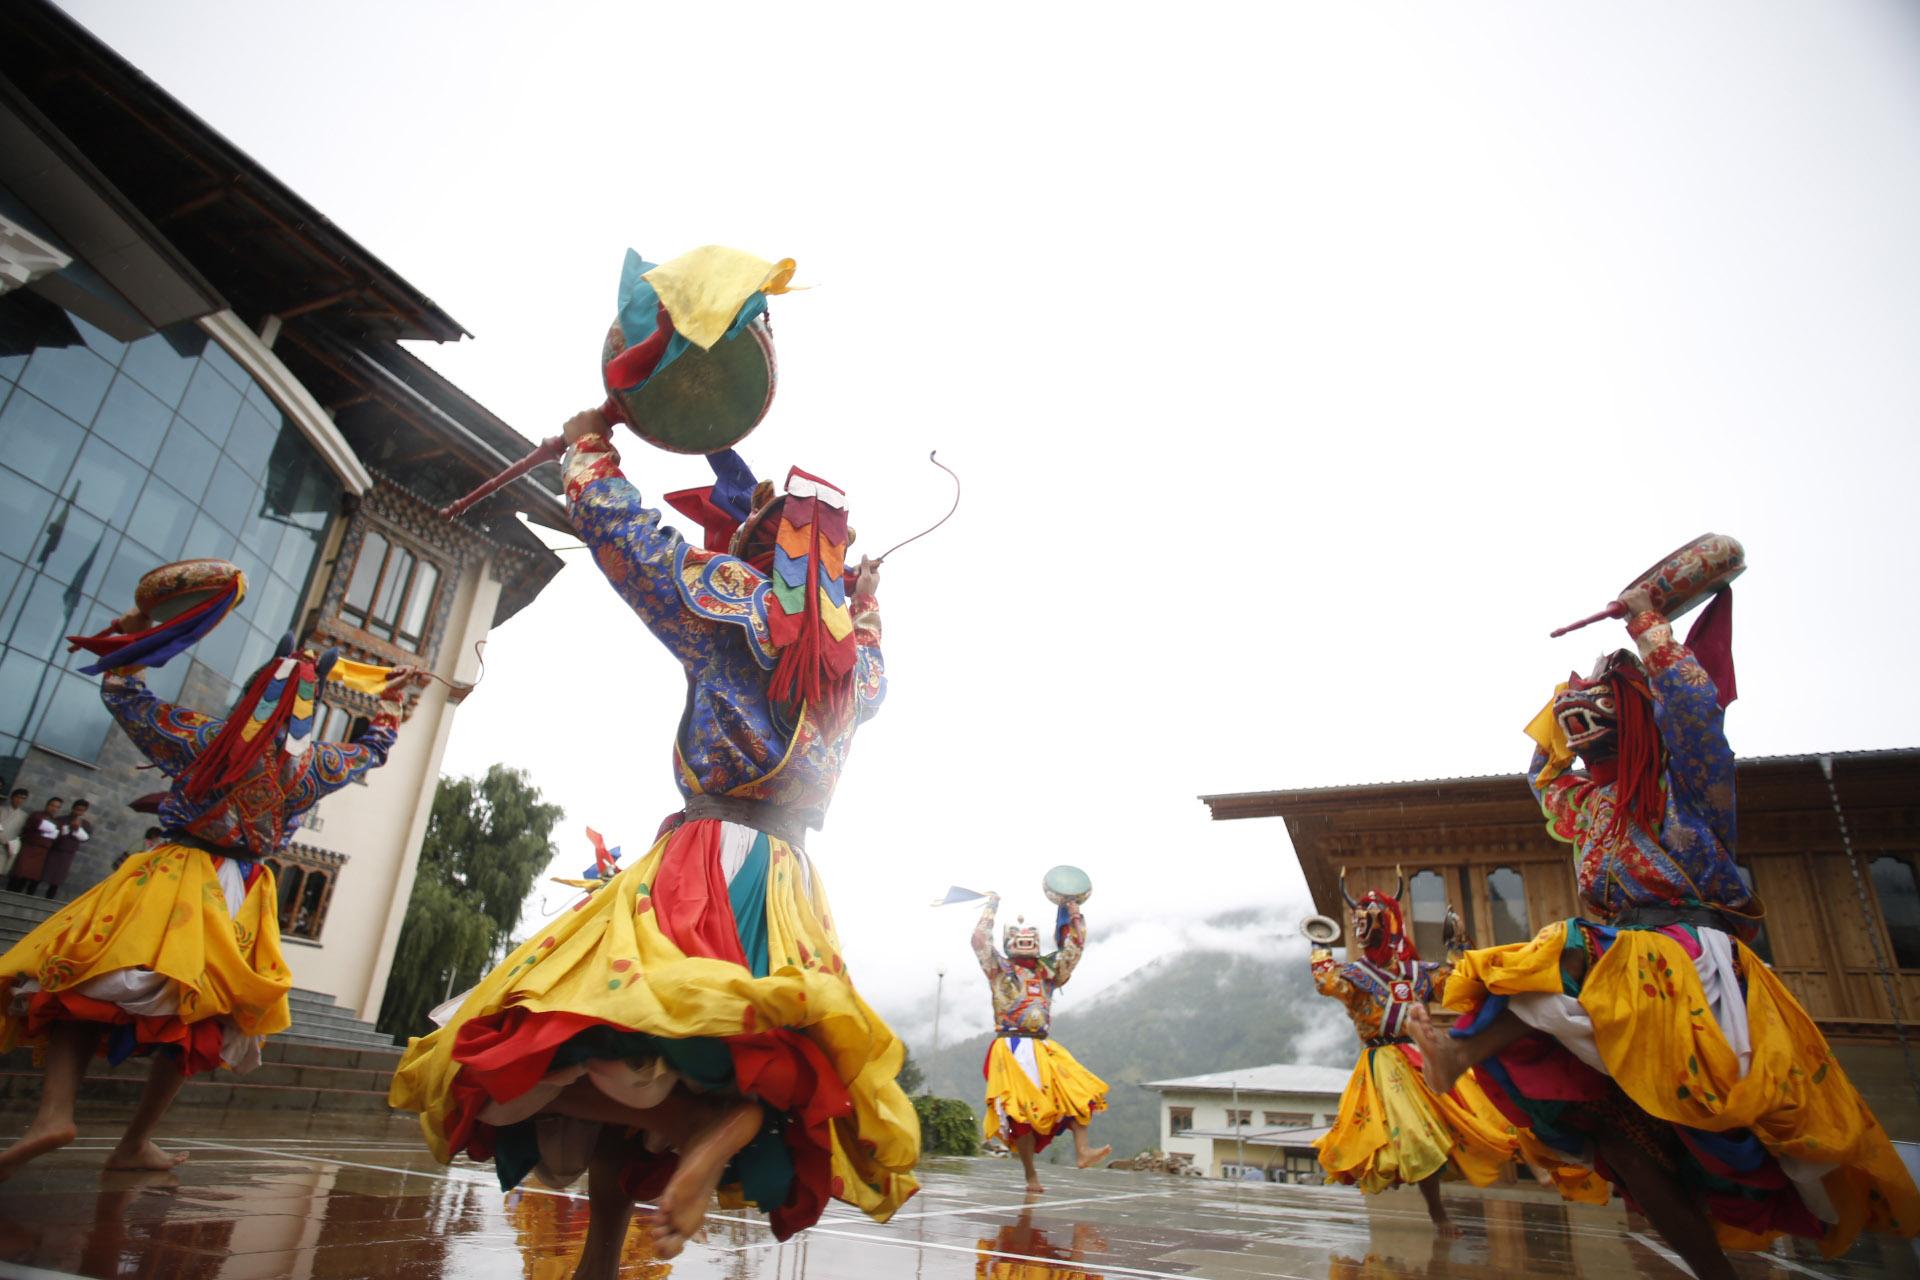 mountain echoes literary festival 2017, bhutan, thimphu